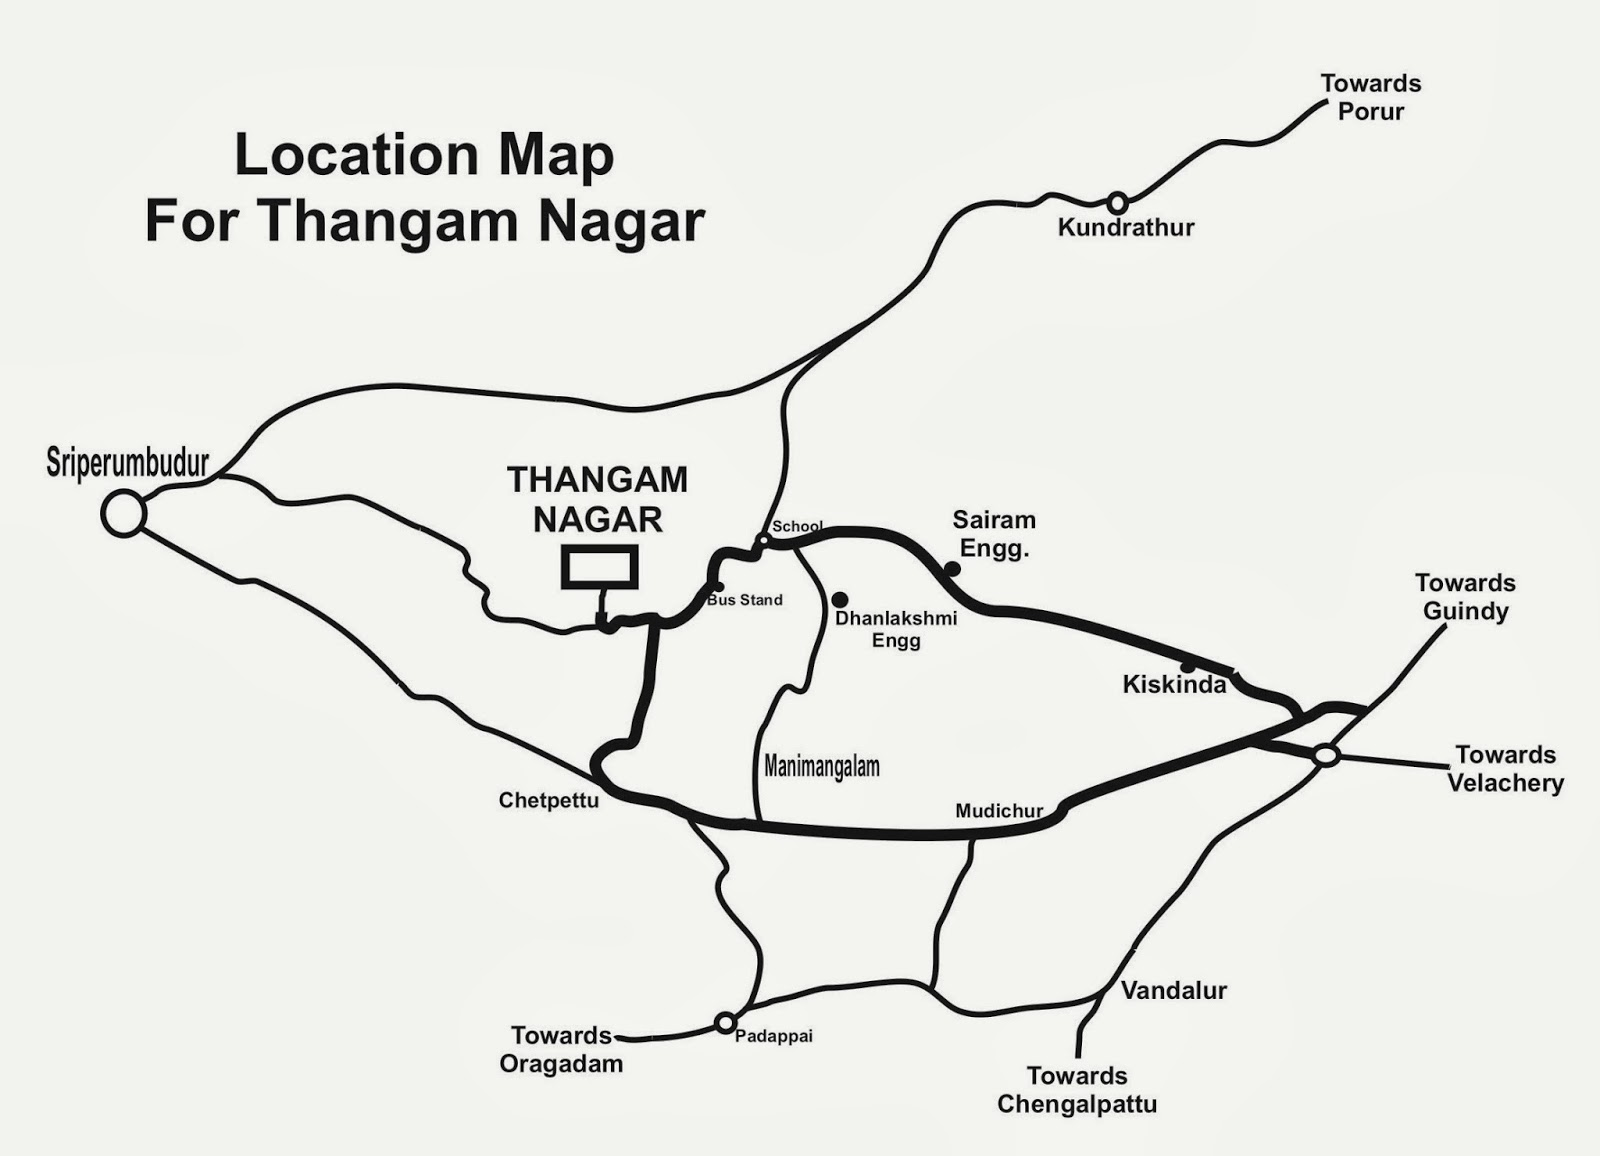 Thangam Nagar